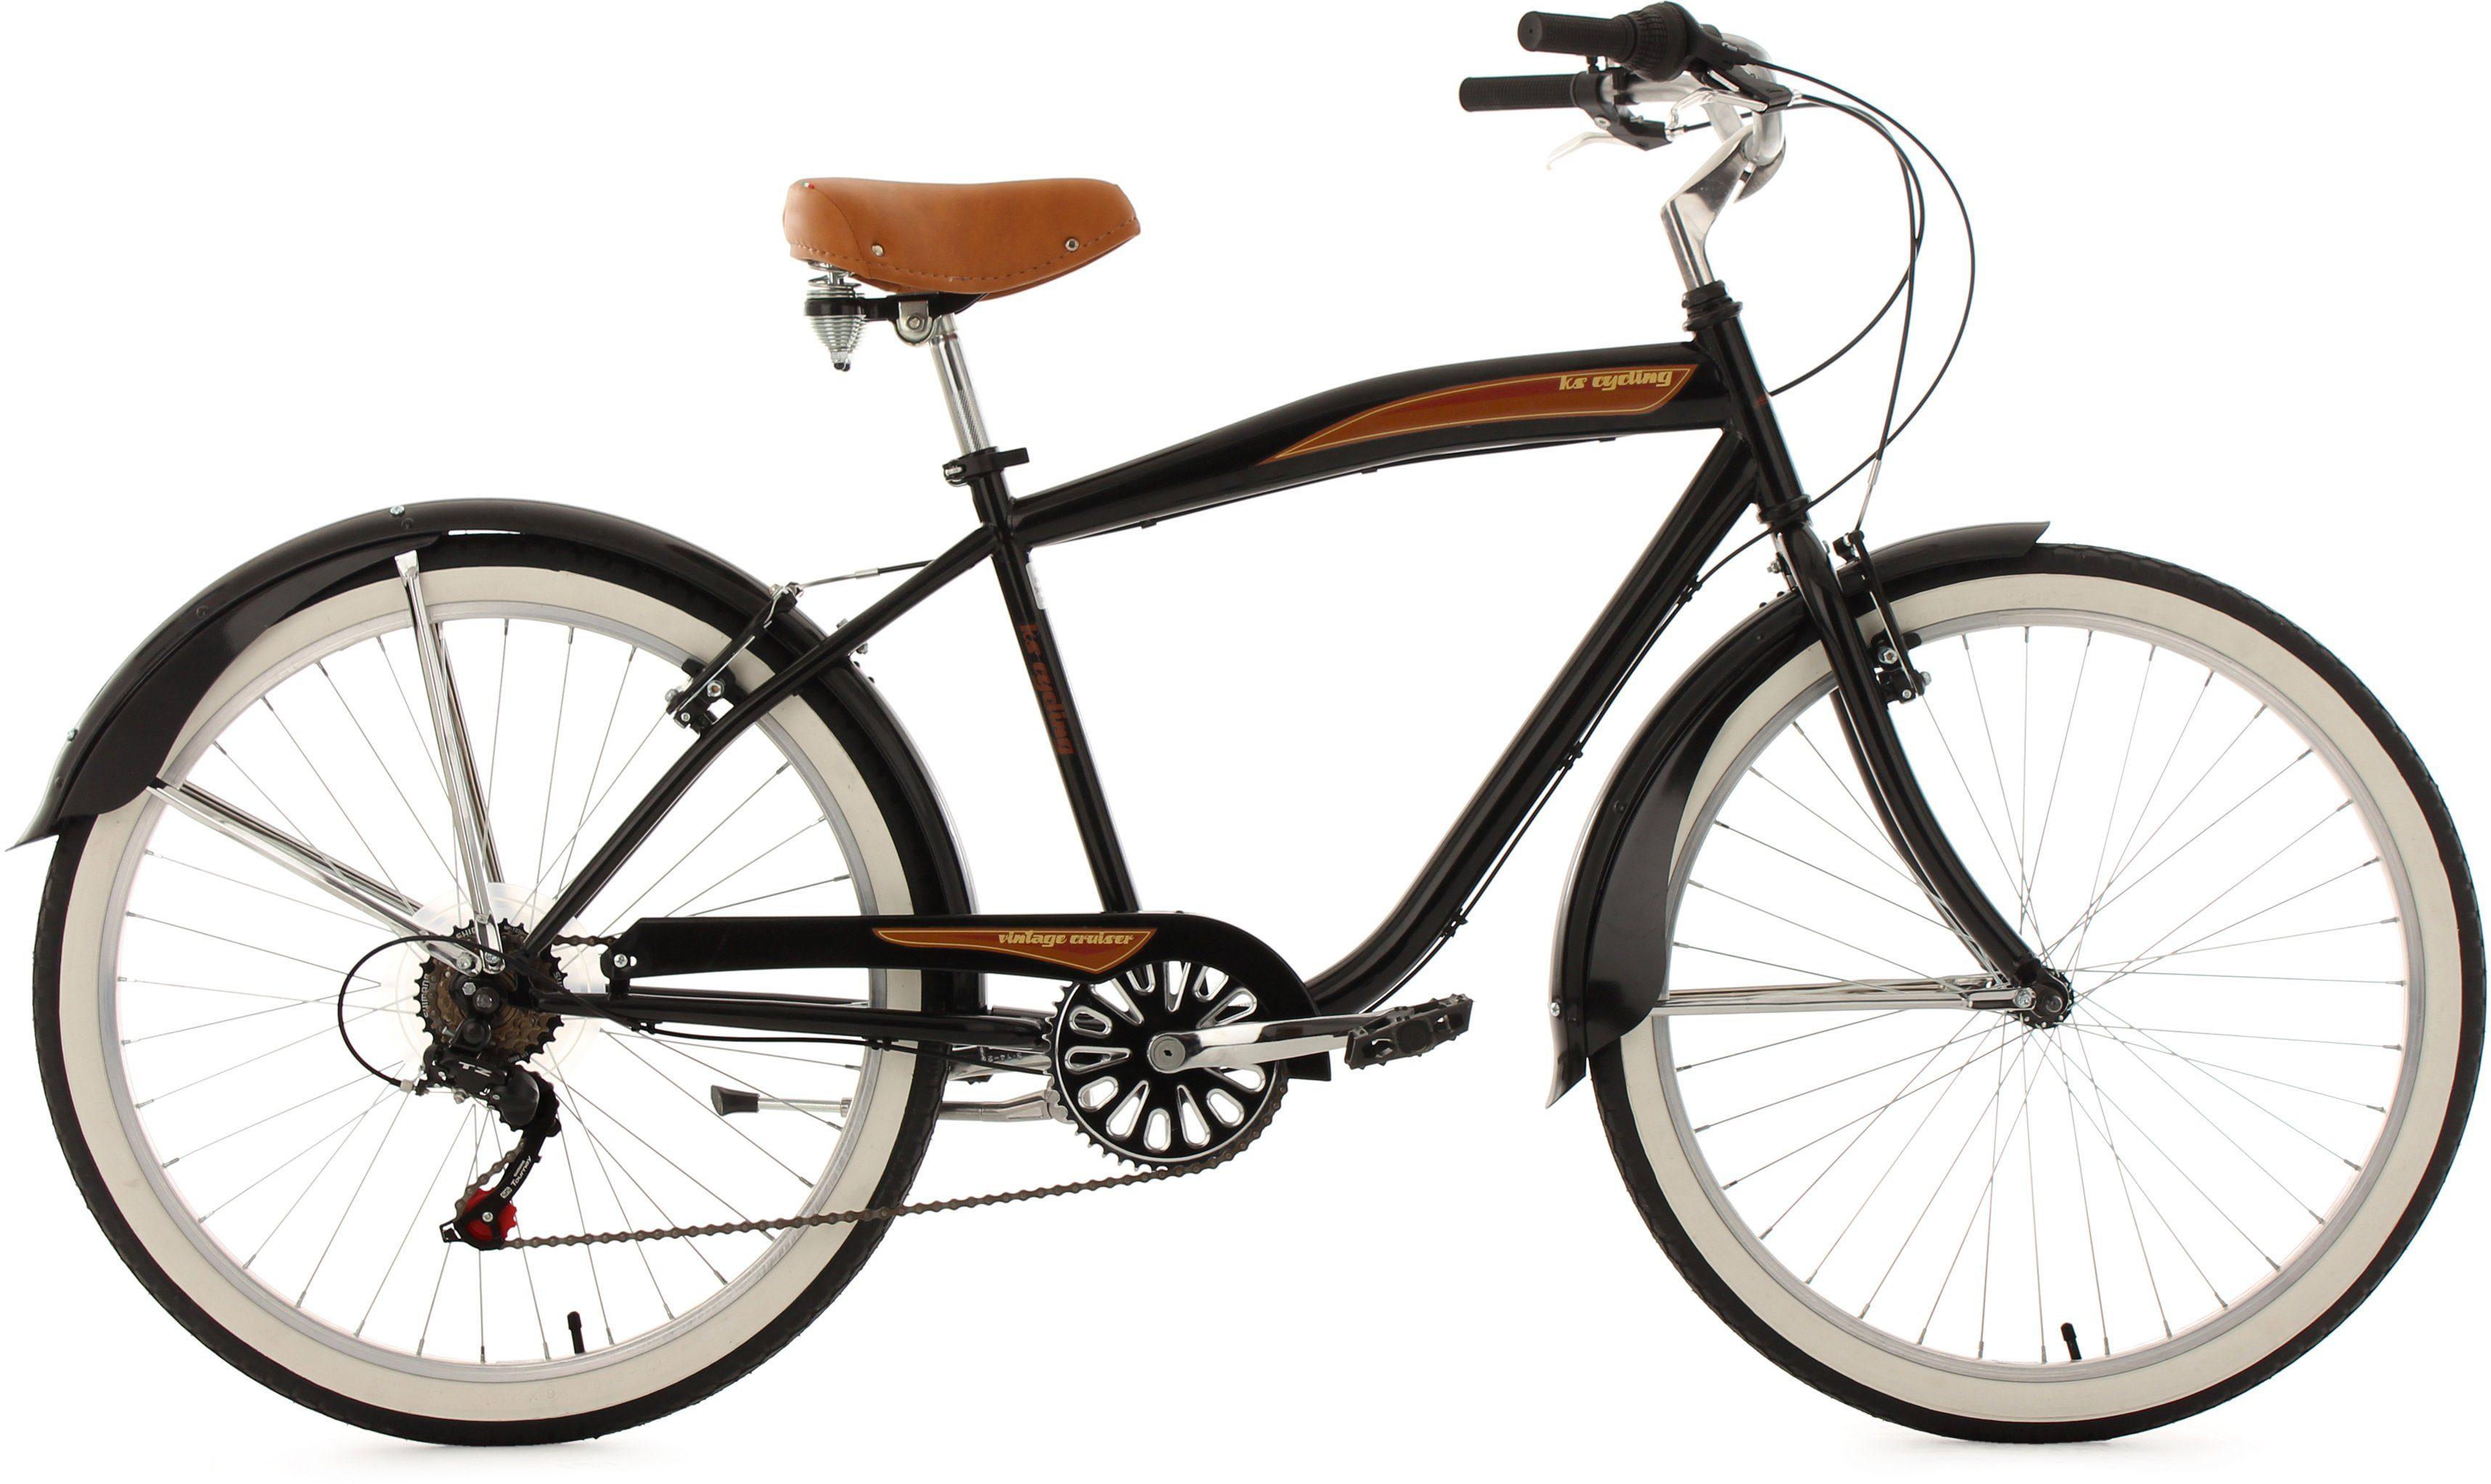 Beachcruiser Herren, KS Cycling, »Vintage«, 26 Zoll 6 Gang Shimano Tourney, V-Brakes